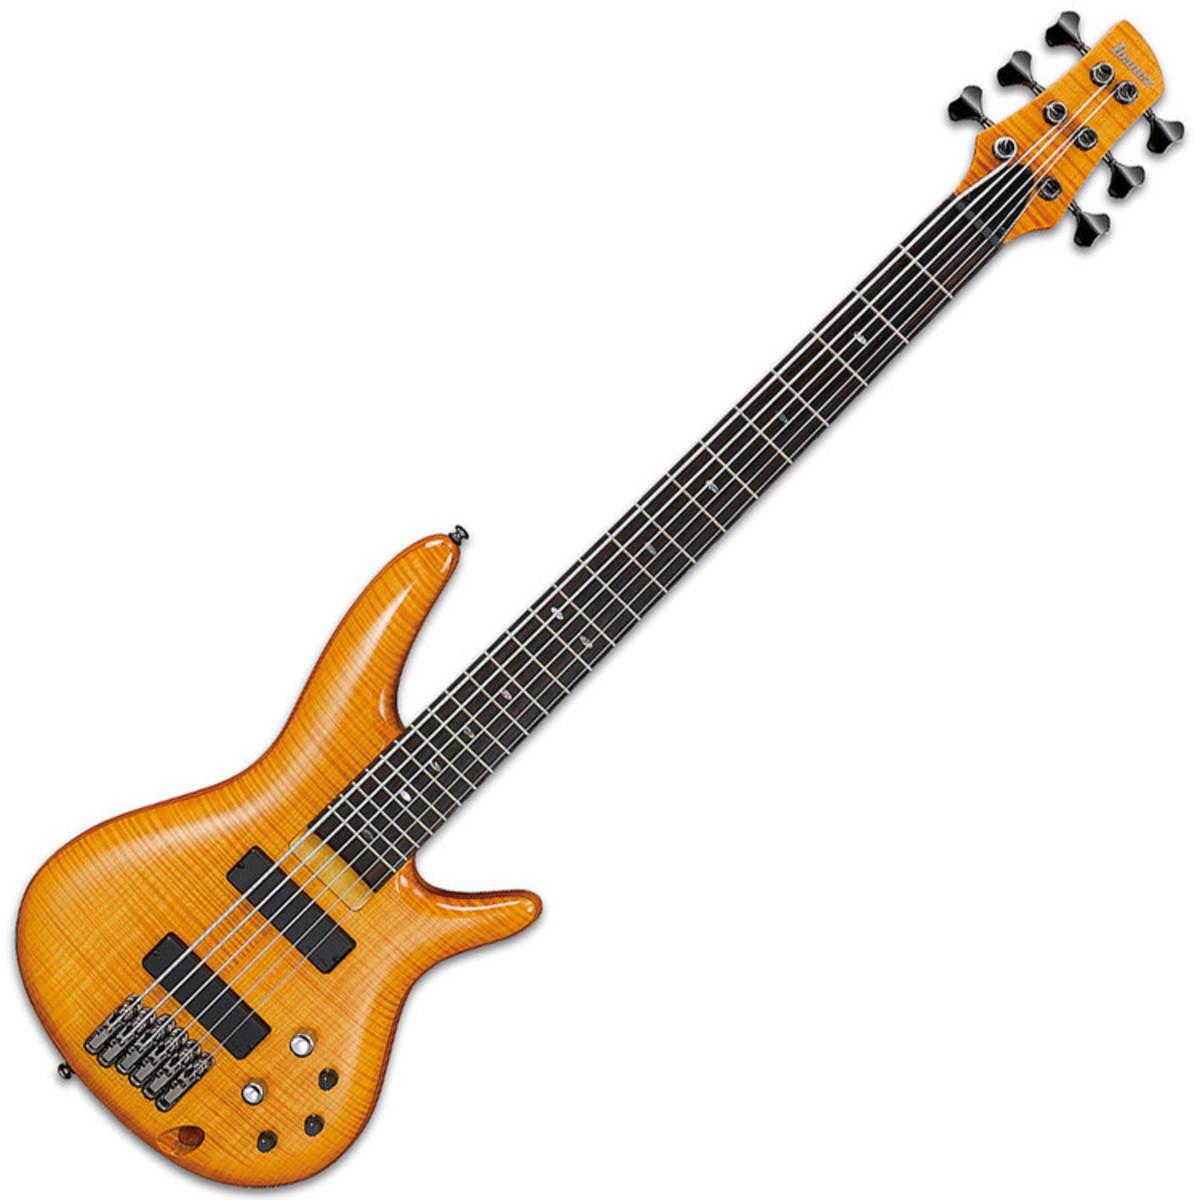 ibanez gvb36 gerald veasley signature 6 string bass guitar amber at. Black Bedroom Furniture Sets. Home Design Ideas